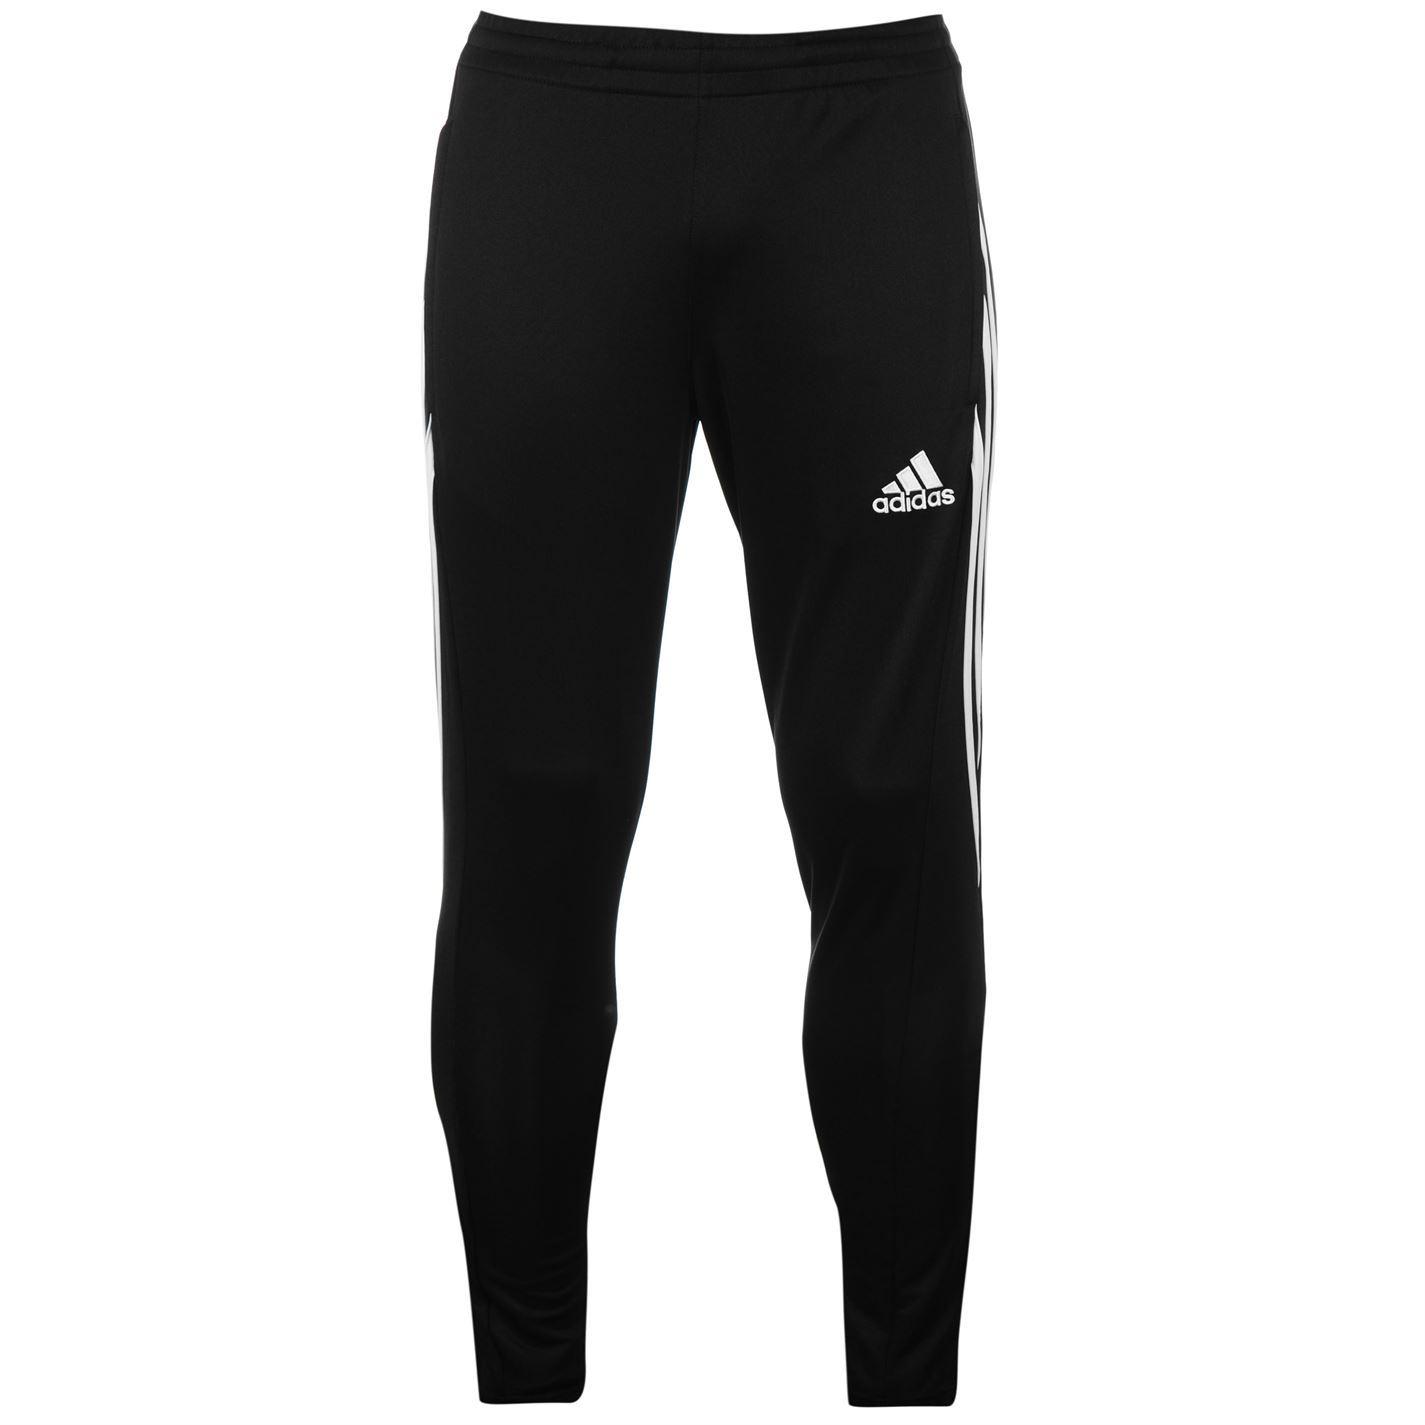 Adidas Mens 3s Sereno Joggers Elasticated Waist Training